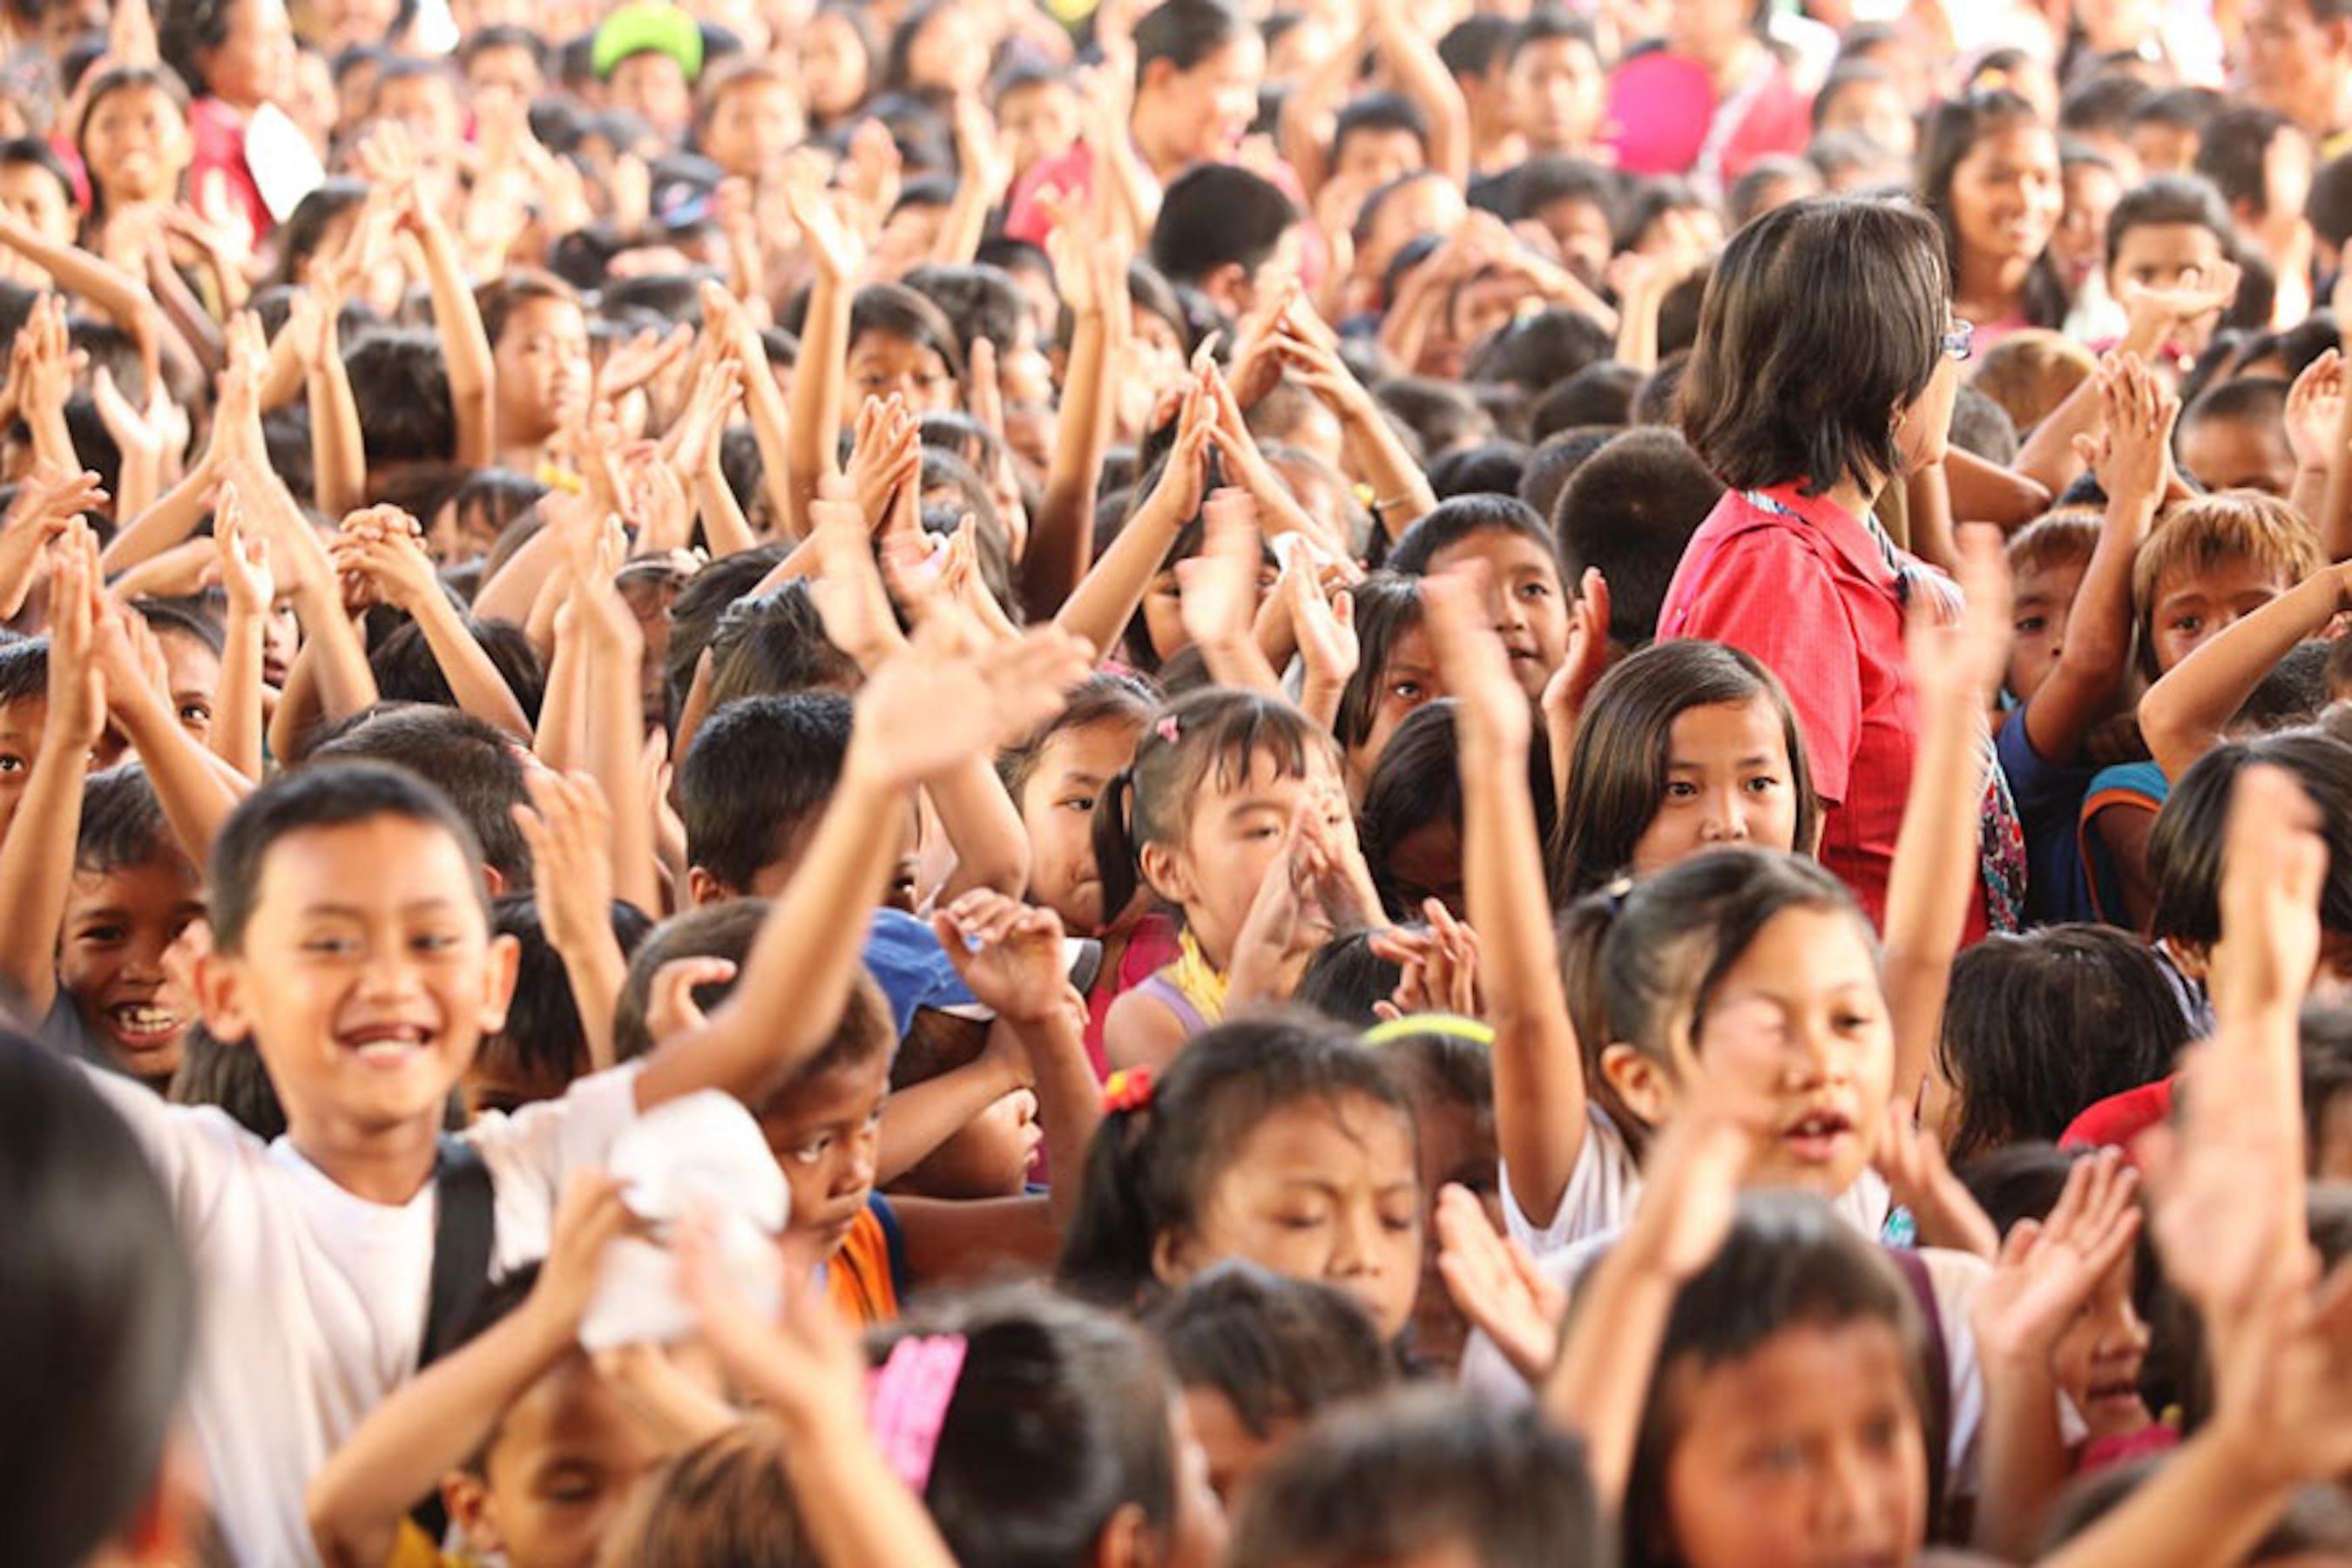 Bambini della Kapangian Central School a Tacloban (Filippine) - ©UNICEF Filippine/2014-0024/Reyna